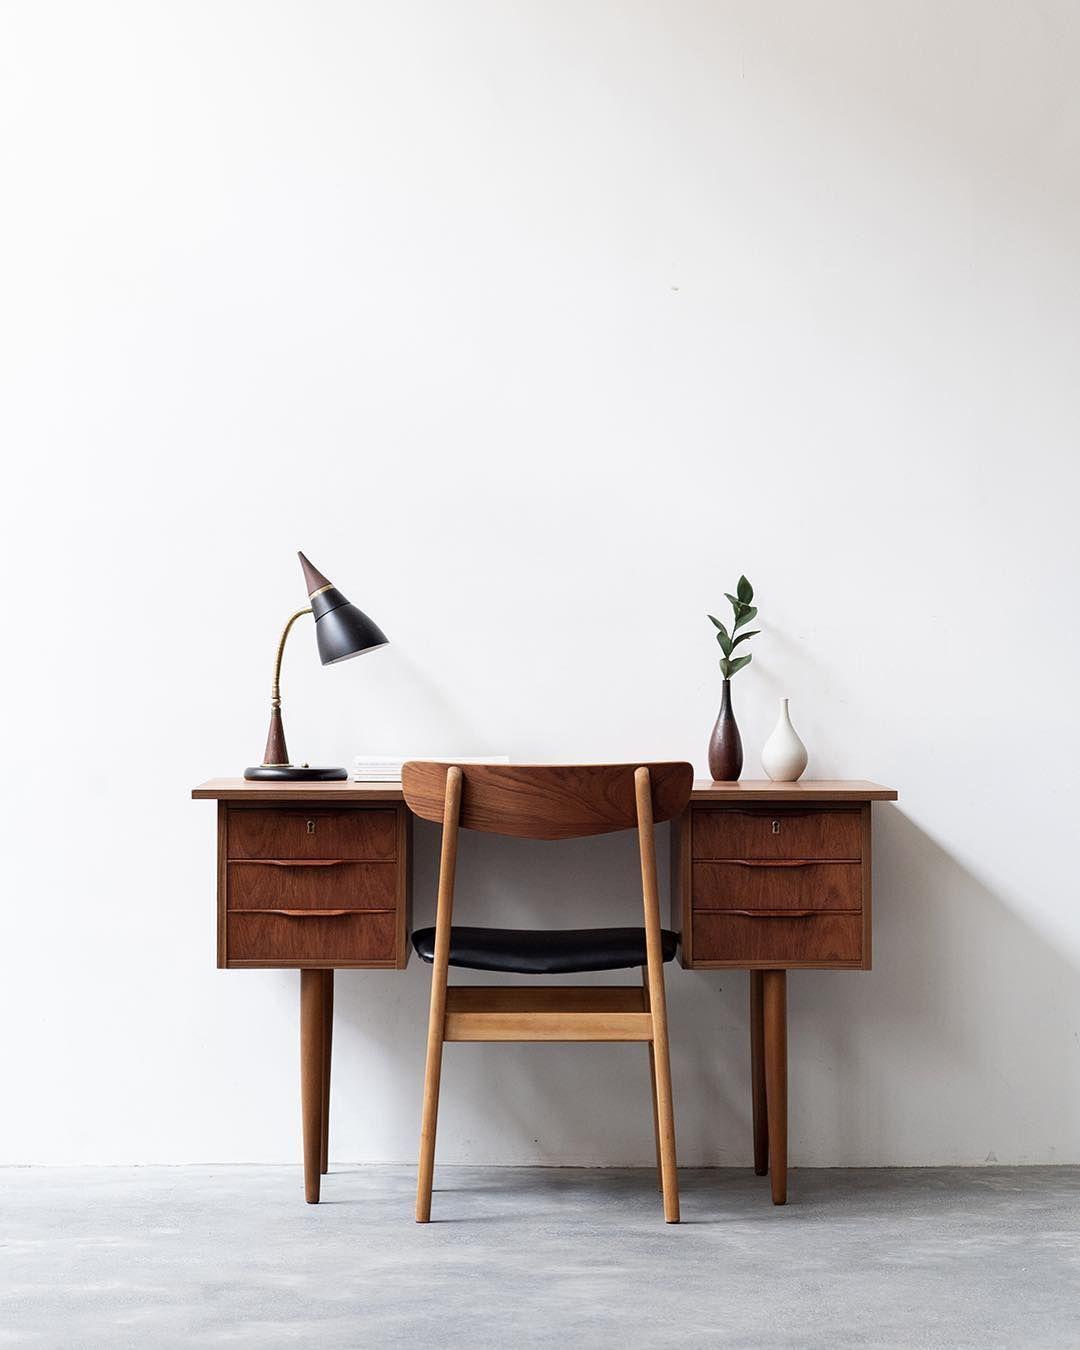 Interior Design Addict Noden On Instagram Vintage Freestanding Danish Desk In Teak Fully Restored Happy In Her Ne Interior Home Decor Desk In Living Room